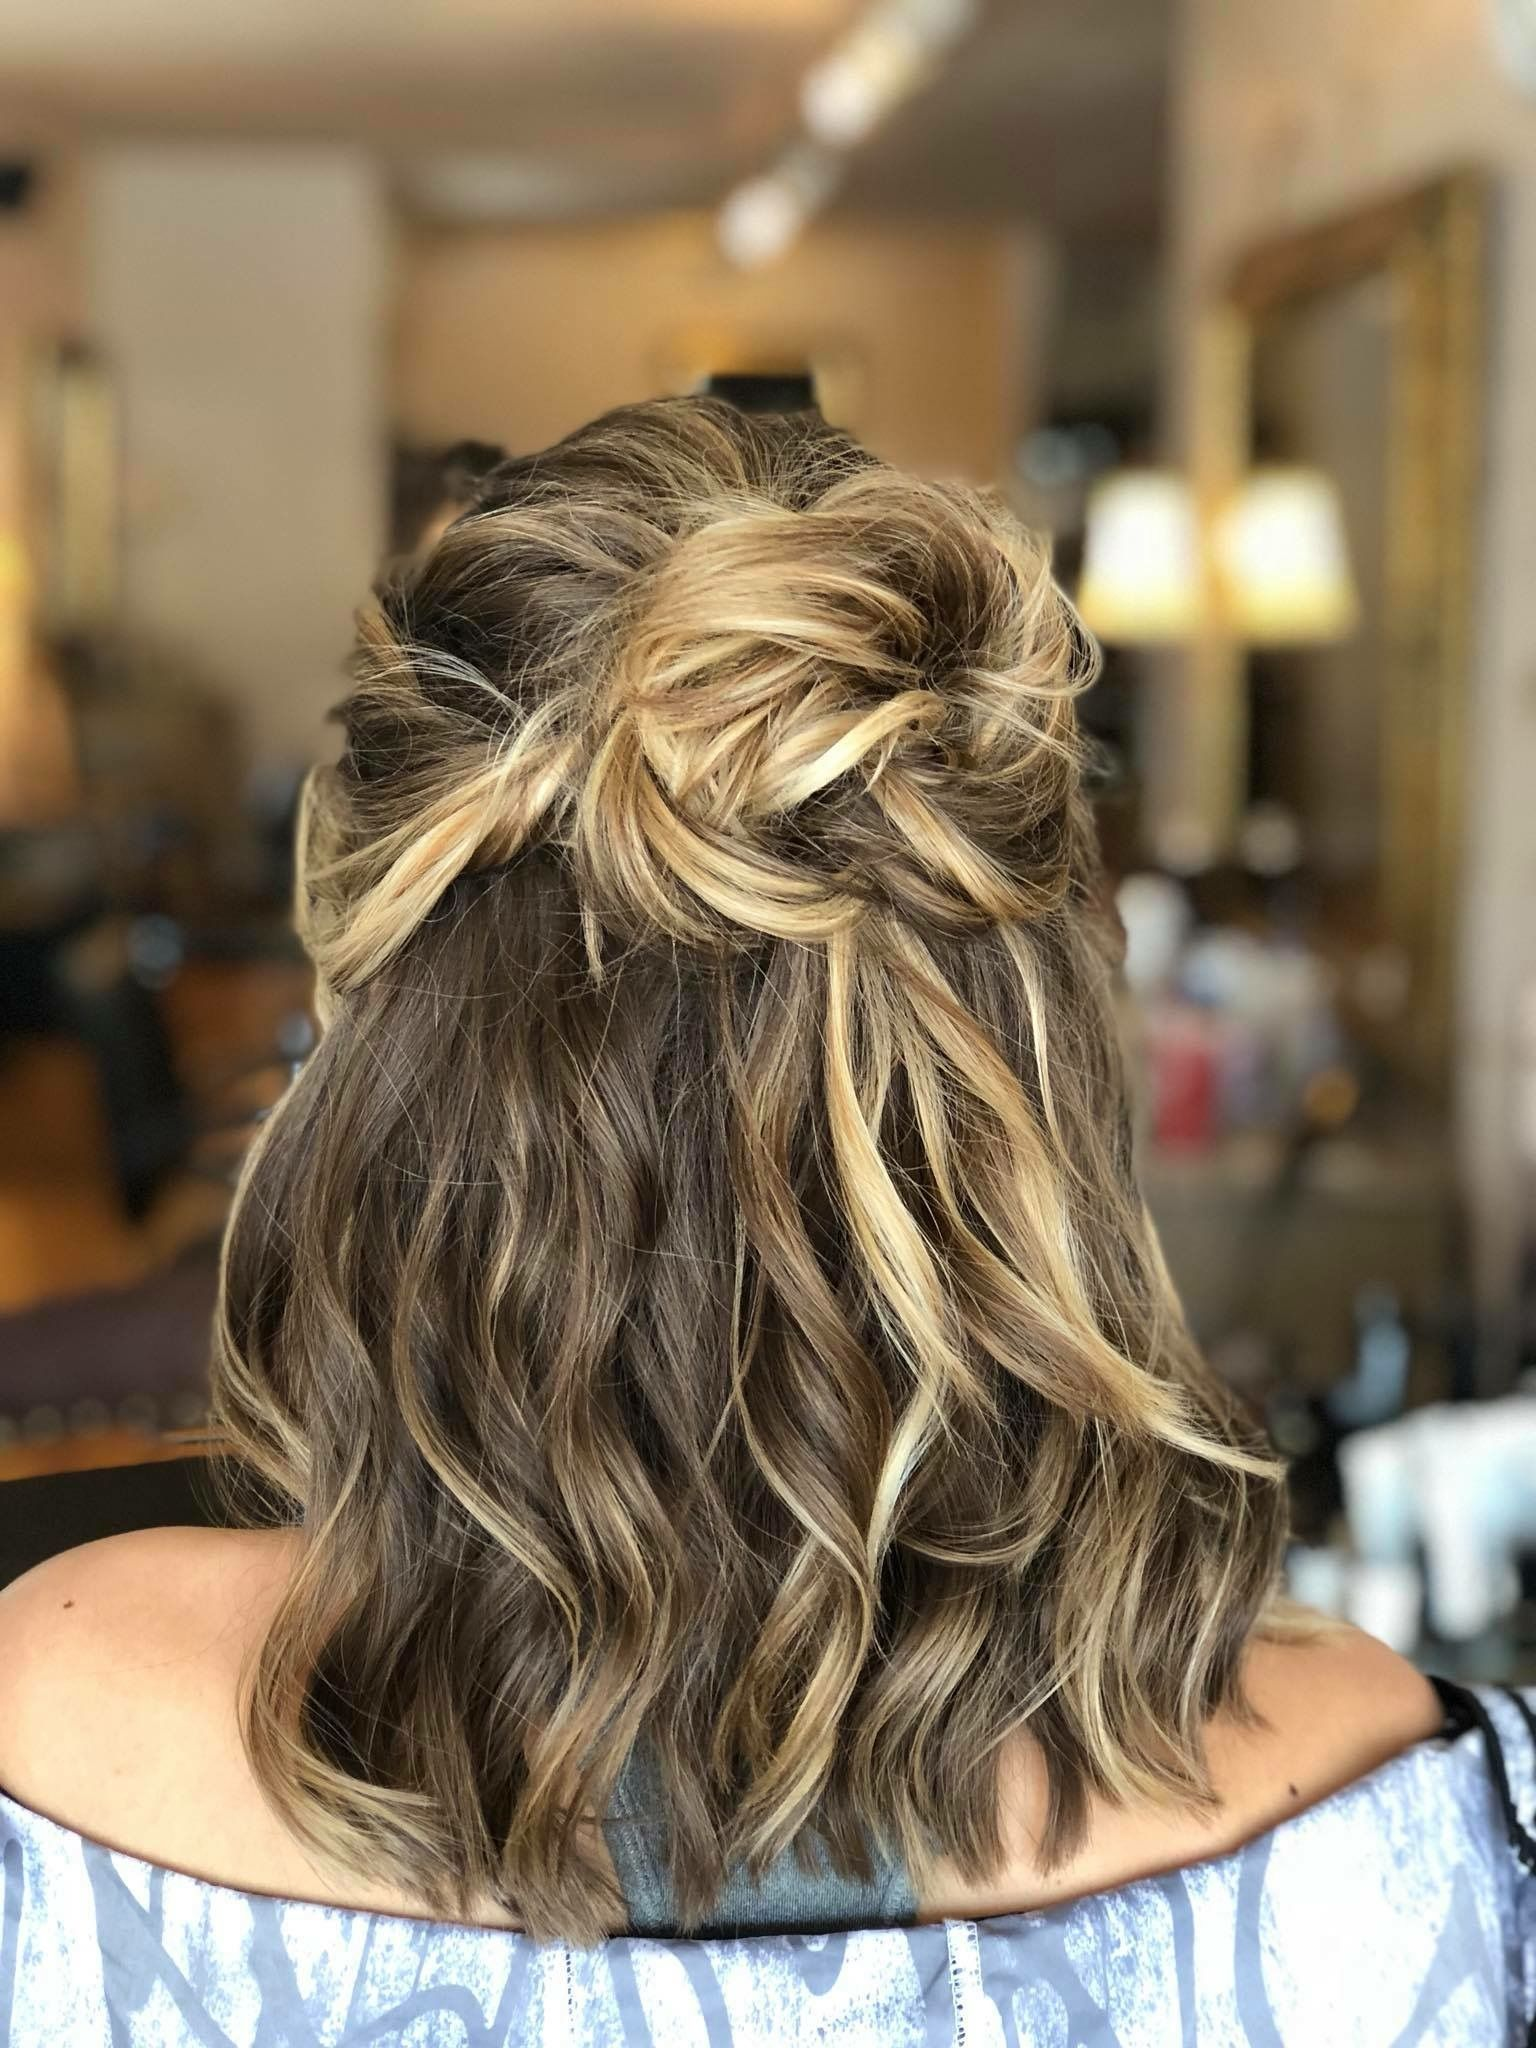 Prom Hair Half Up Half Down Curl Homecoming Bun Prom Hairstyles For Short Hair Half Up Half Down Hair Prom Half Up Hair